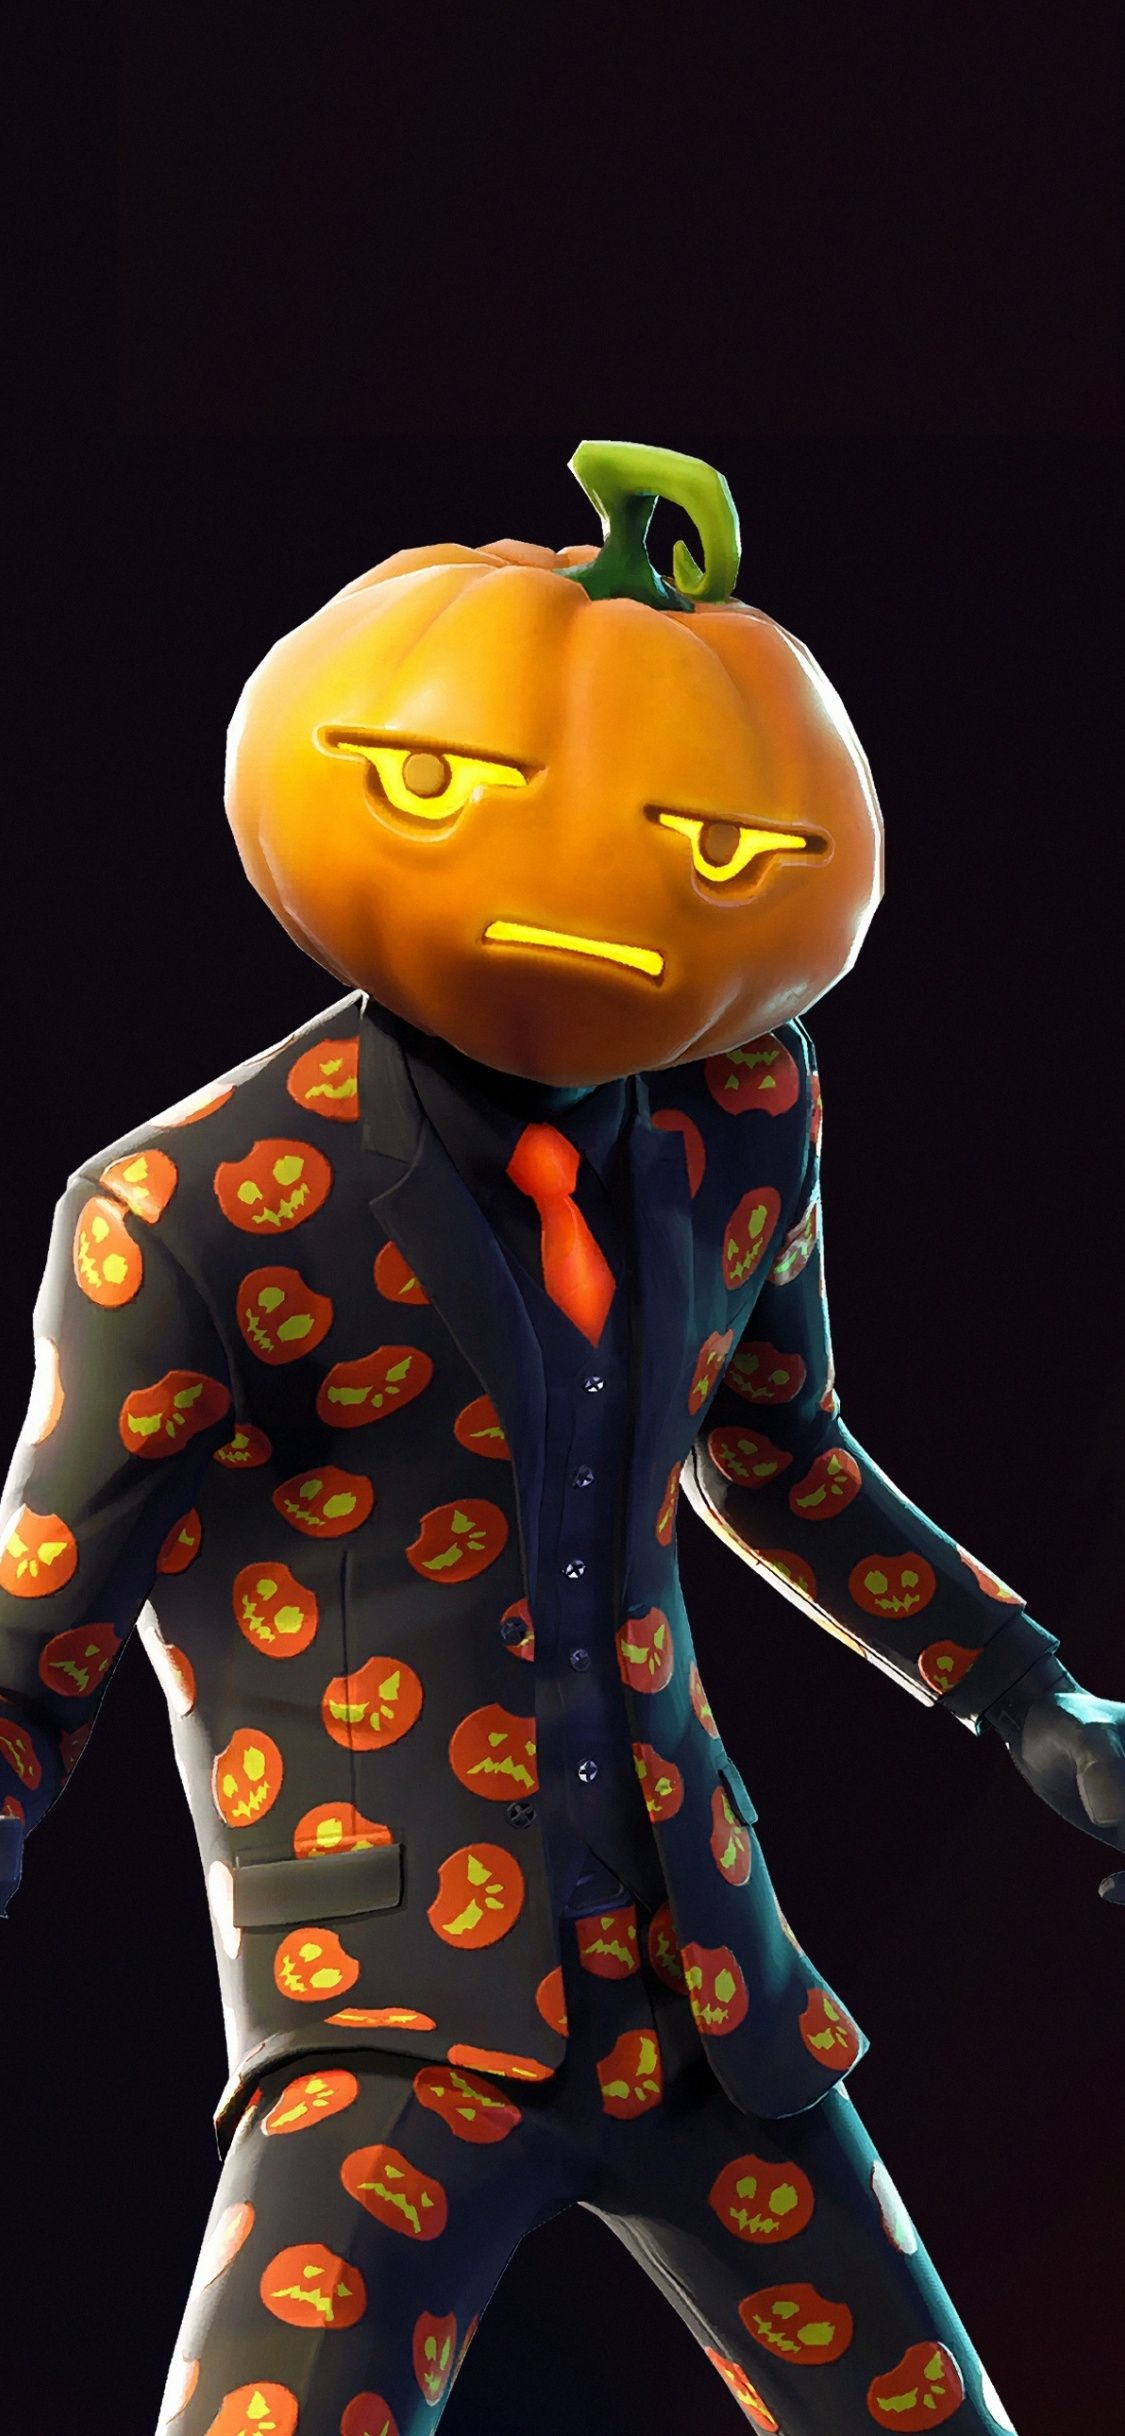 Halloween, pumpkin, pumphead, skin, Fortnite, 2018